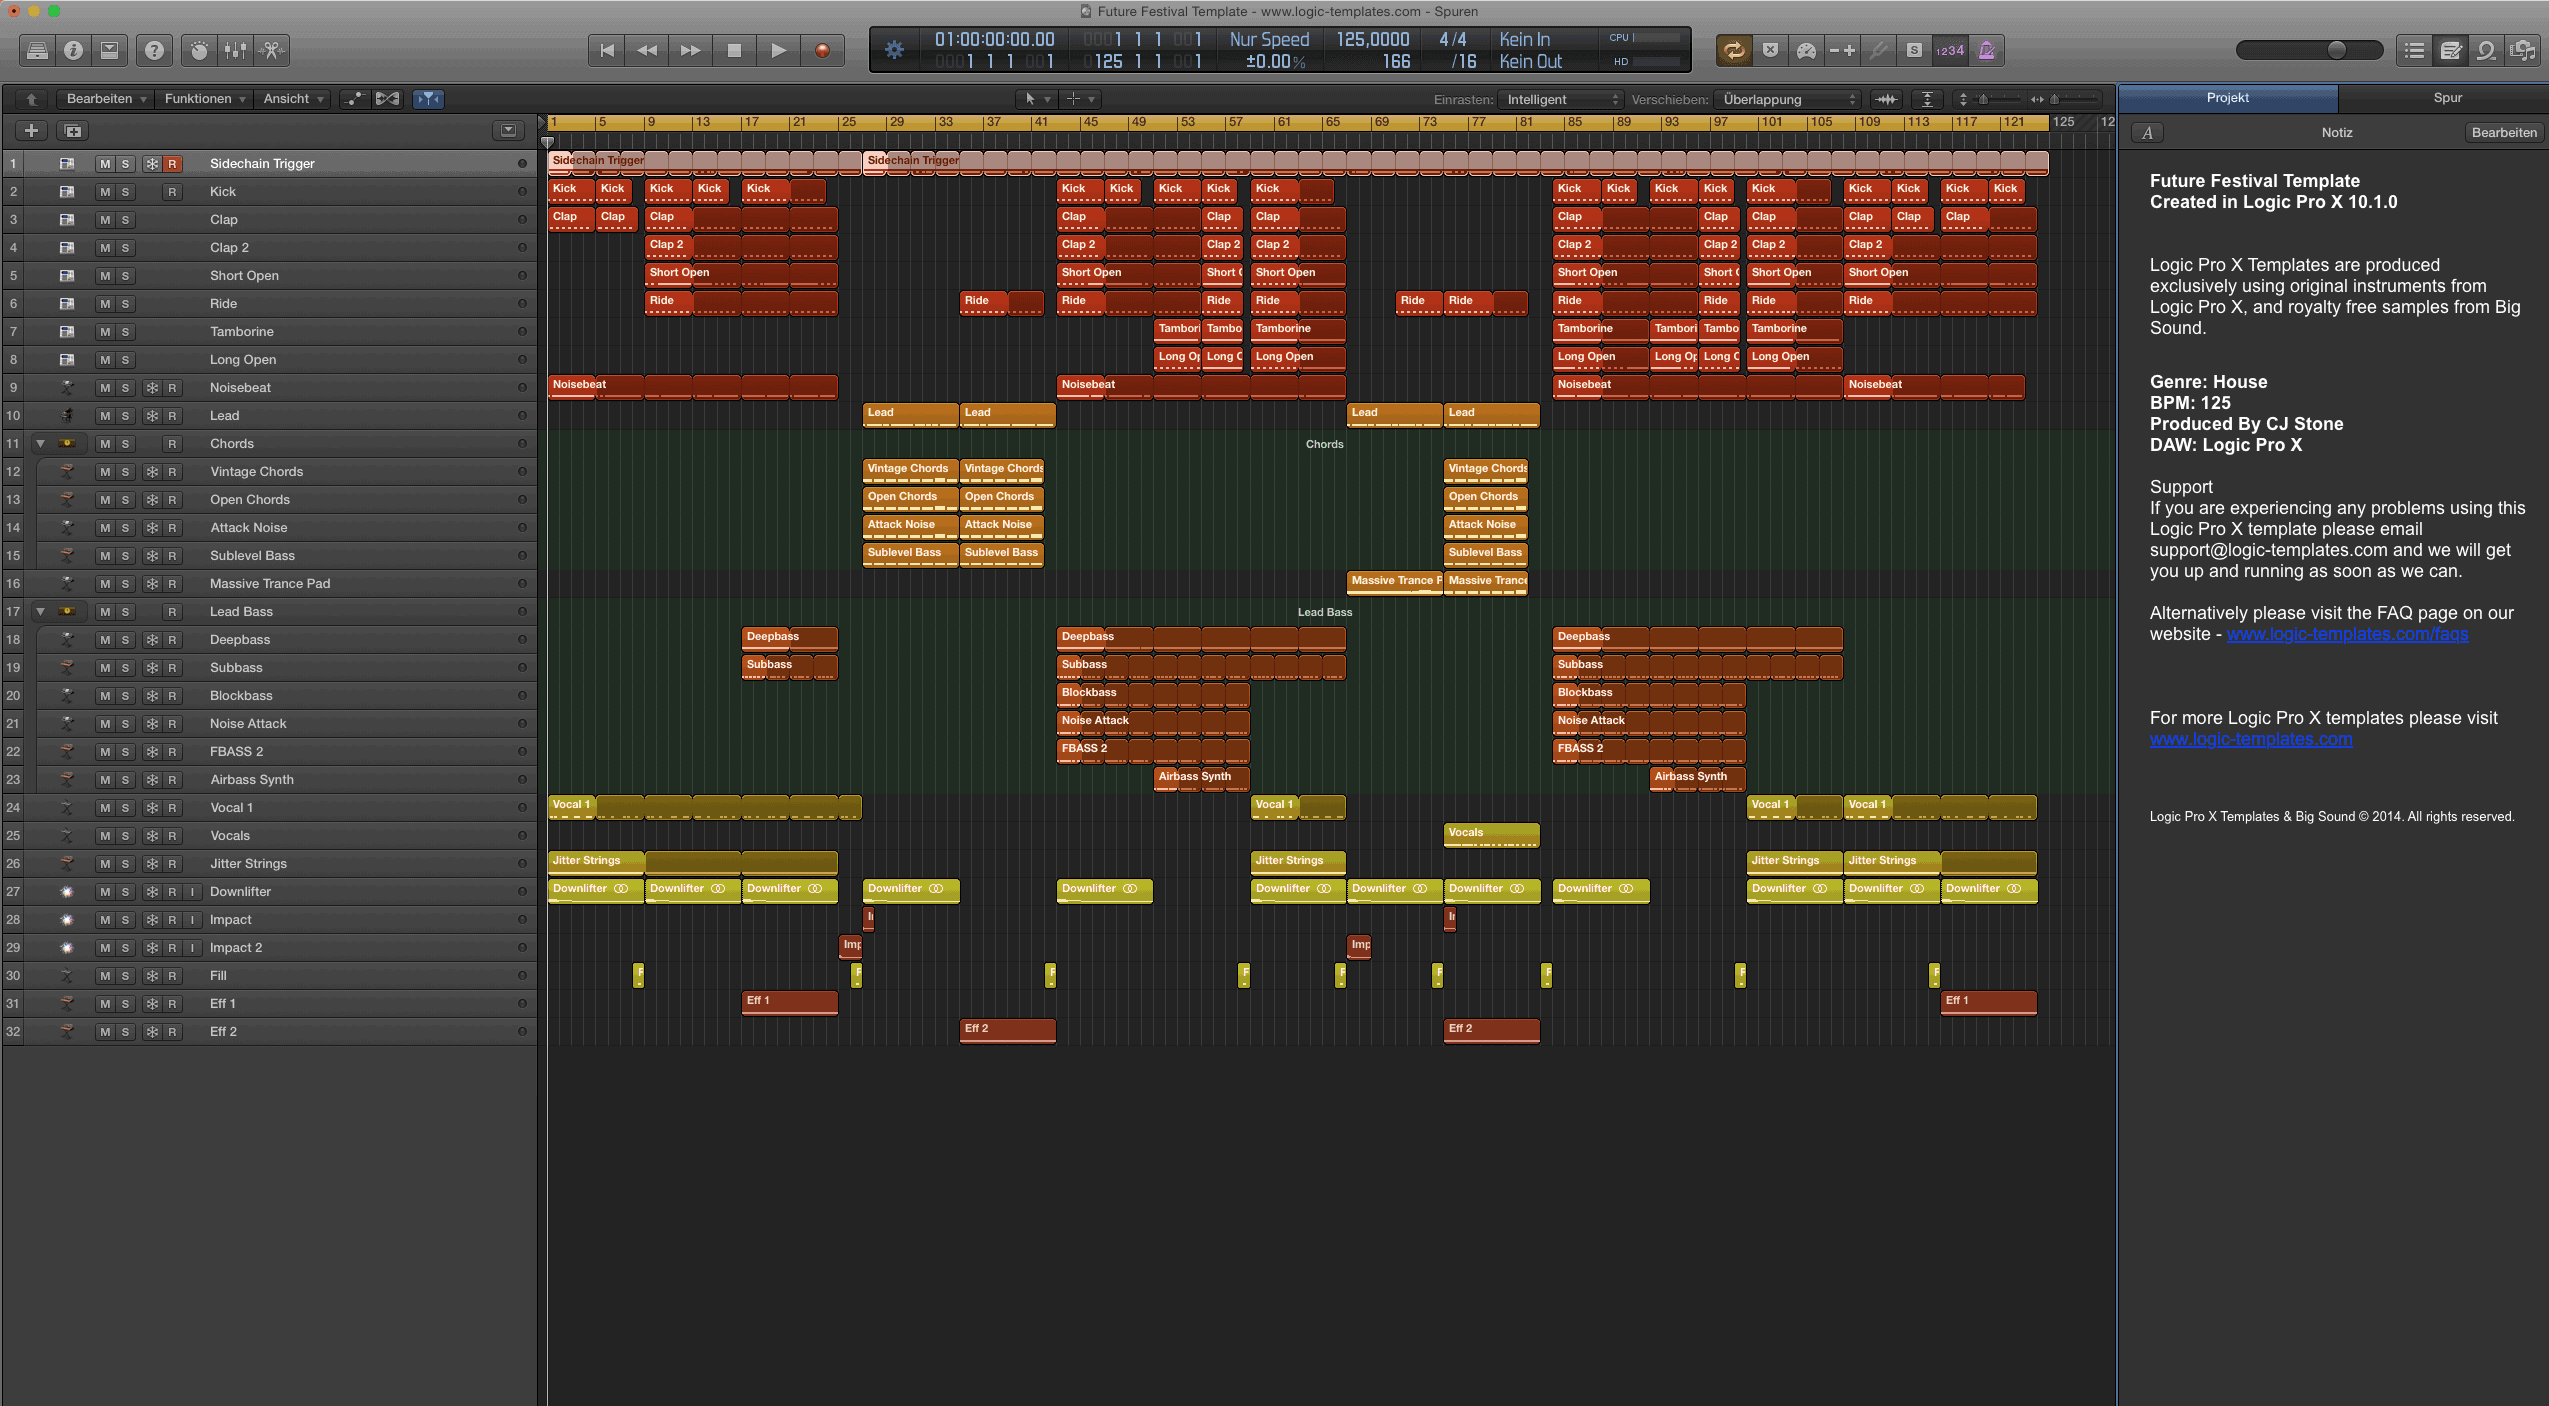 Future Festival Logic Pro X Template